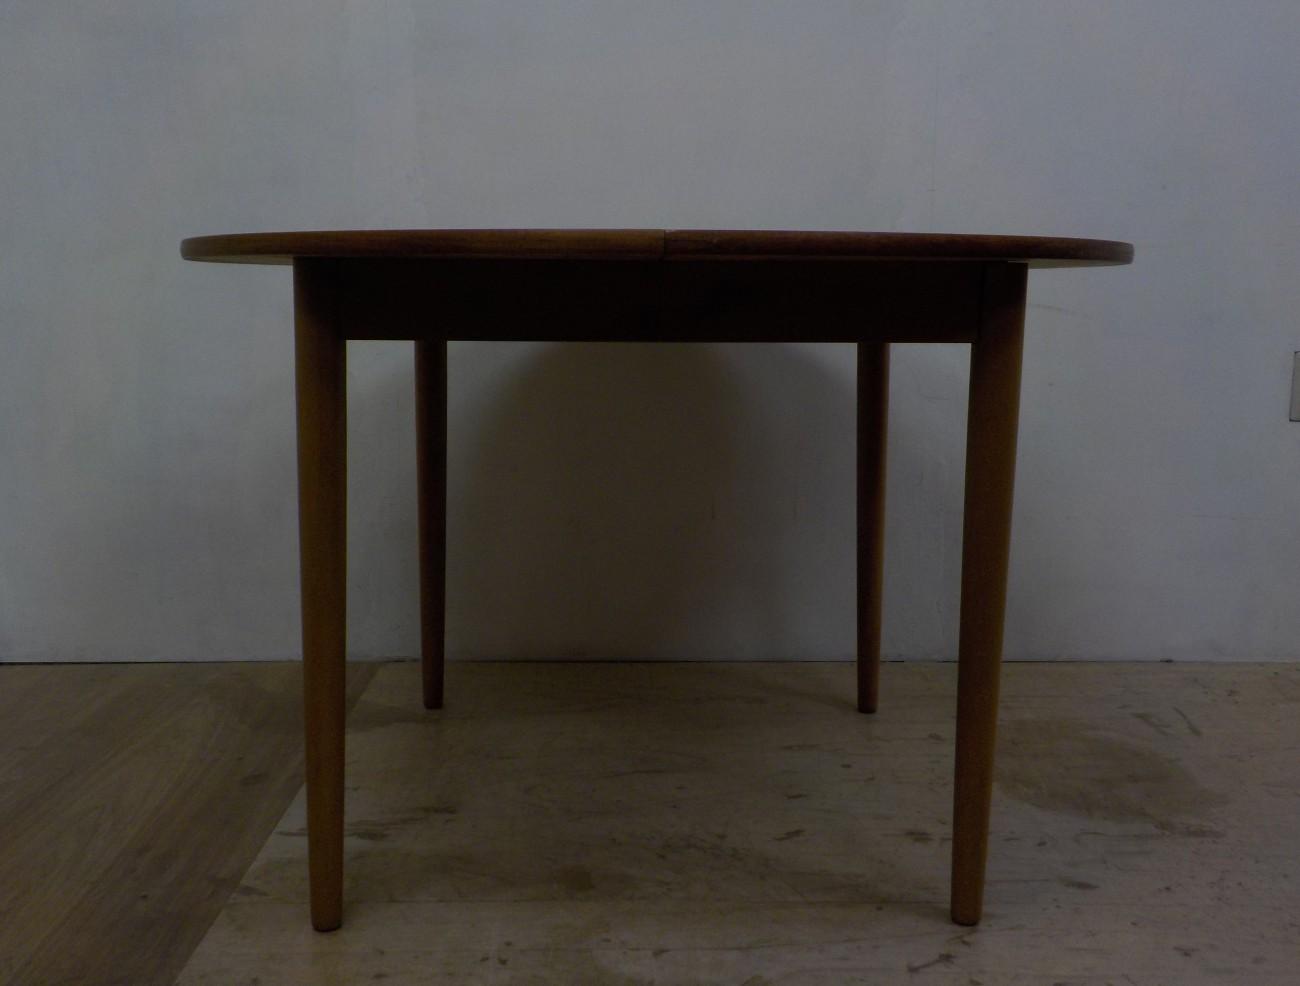 FARSTRUP Dinning table / チークxビーチ エクステンション ダイニングテーブル / stock2012-10